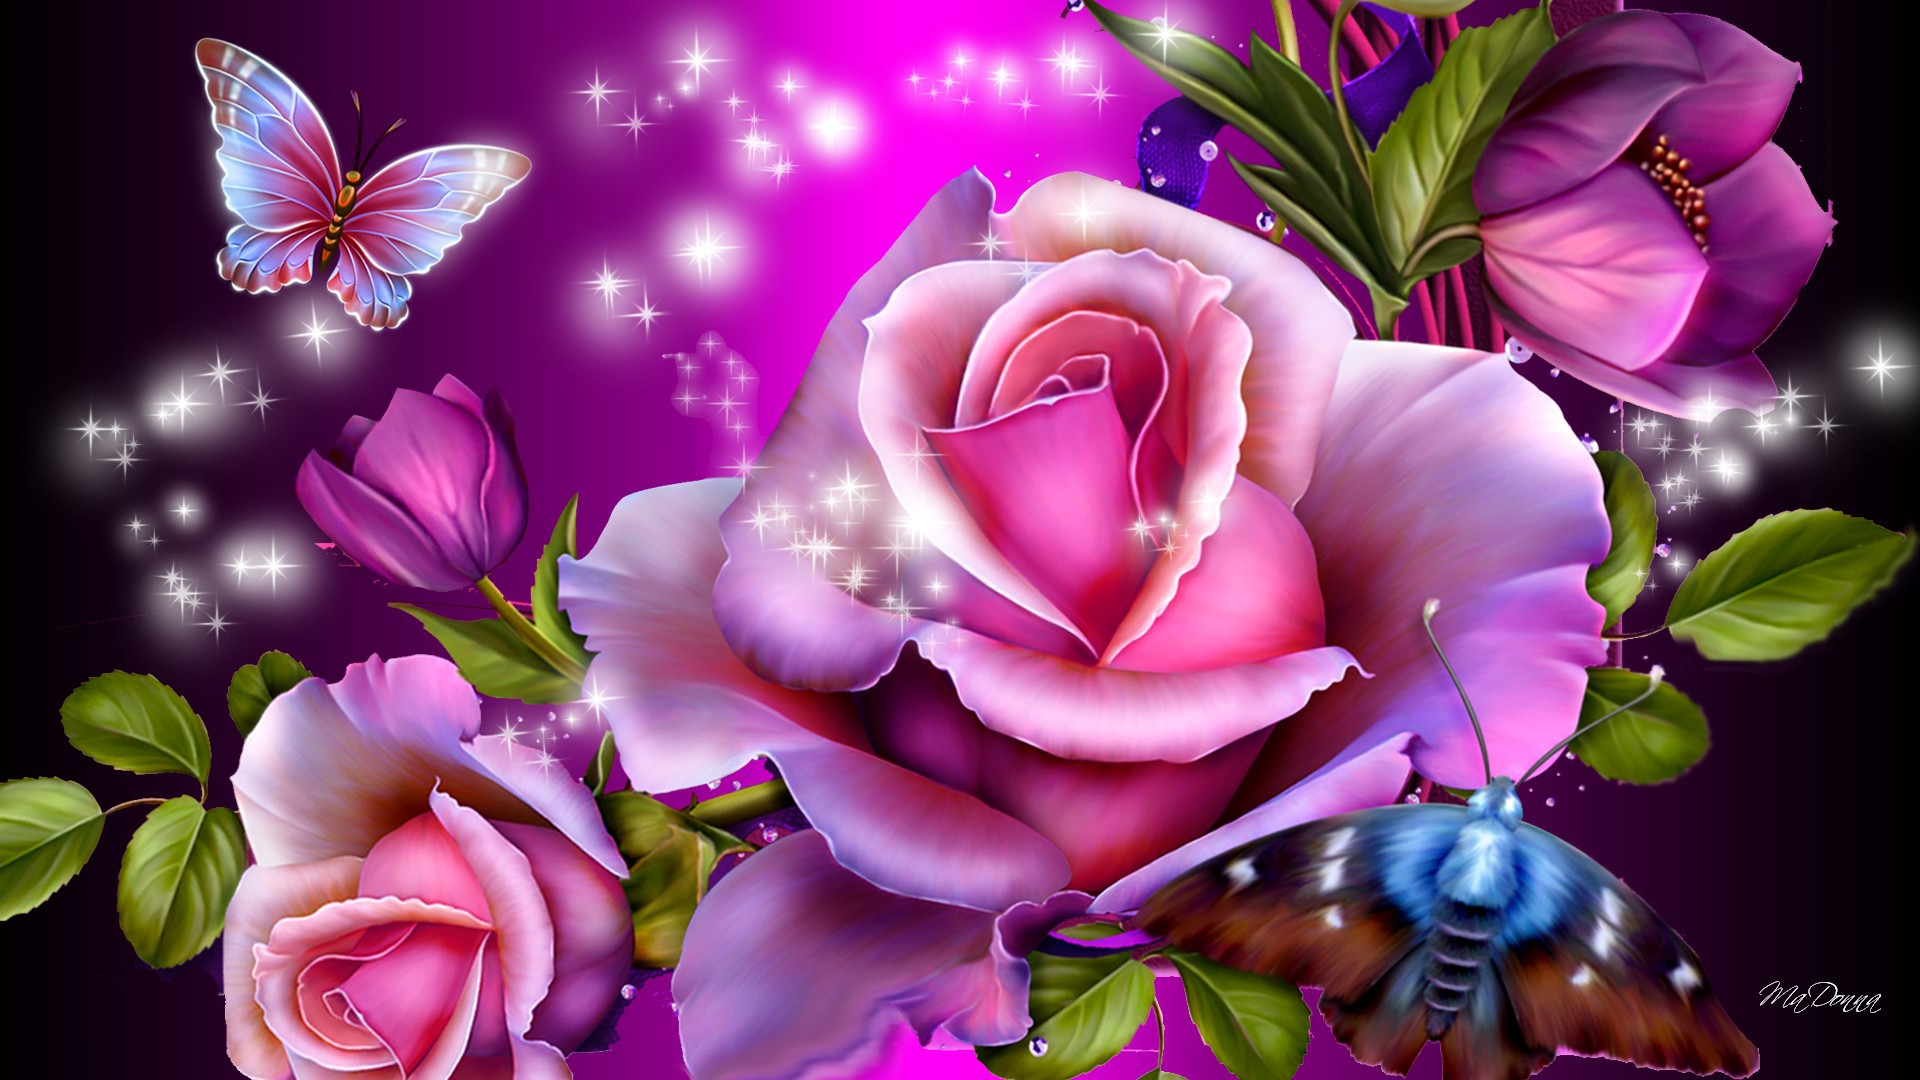 45+ Butterflies and Roses Wallpaper on WallpaperSafari